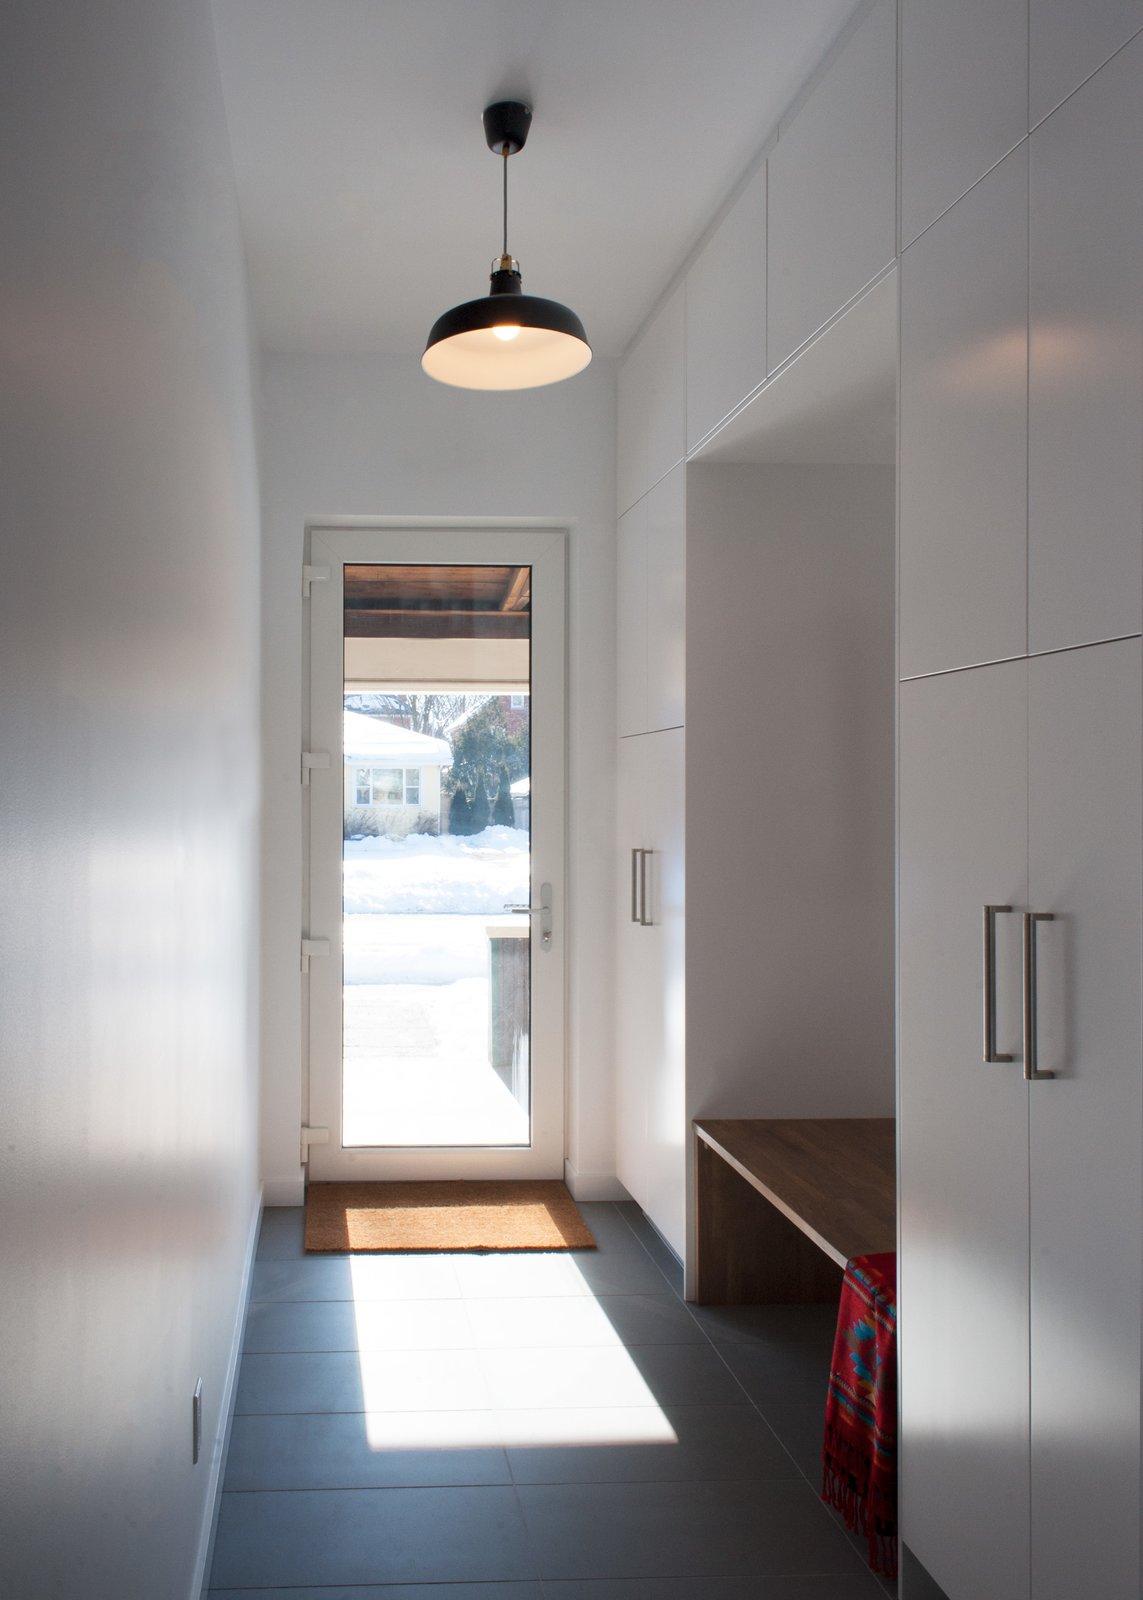 Slate Floor, Ceiling Lighting, Pendant Lighting, Doors, and Exterior Guelph Deep Energy Retrofit - Front Foyer  Best Photos from Guelph Deep Energy Retrofit